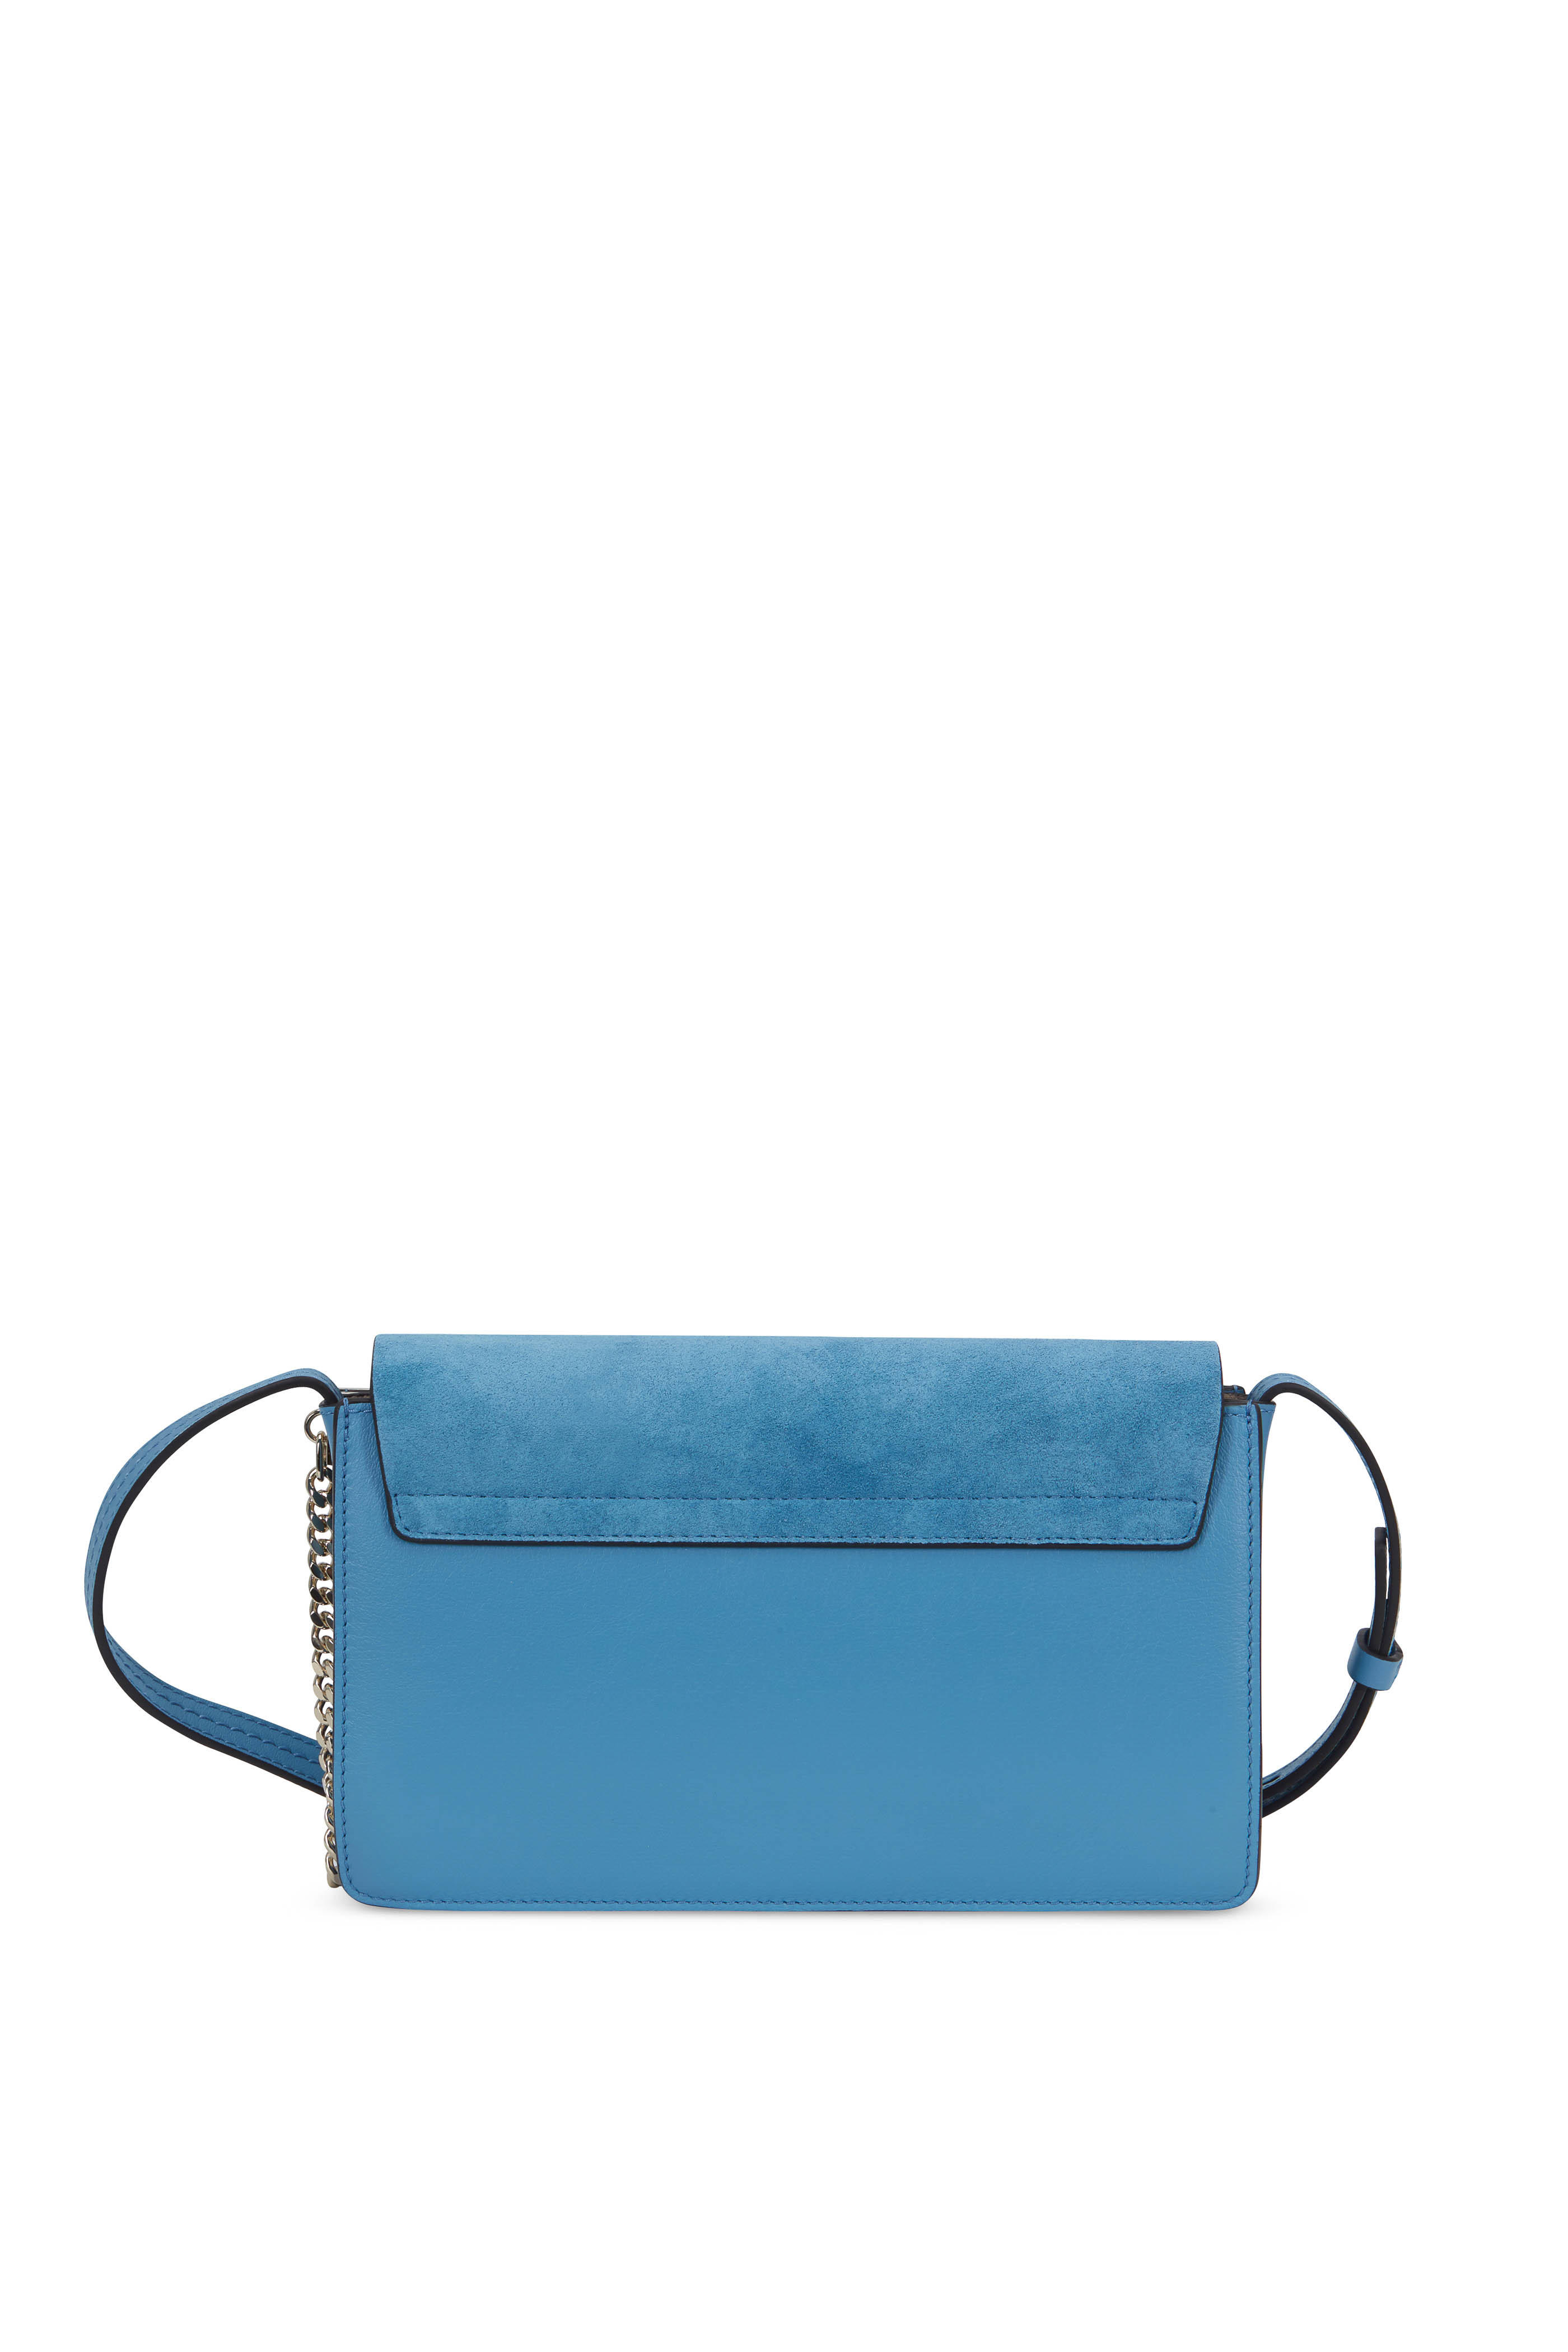 995e6cf0 Faye Tomboy Blue Leather & Suede Crossbody